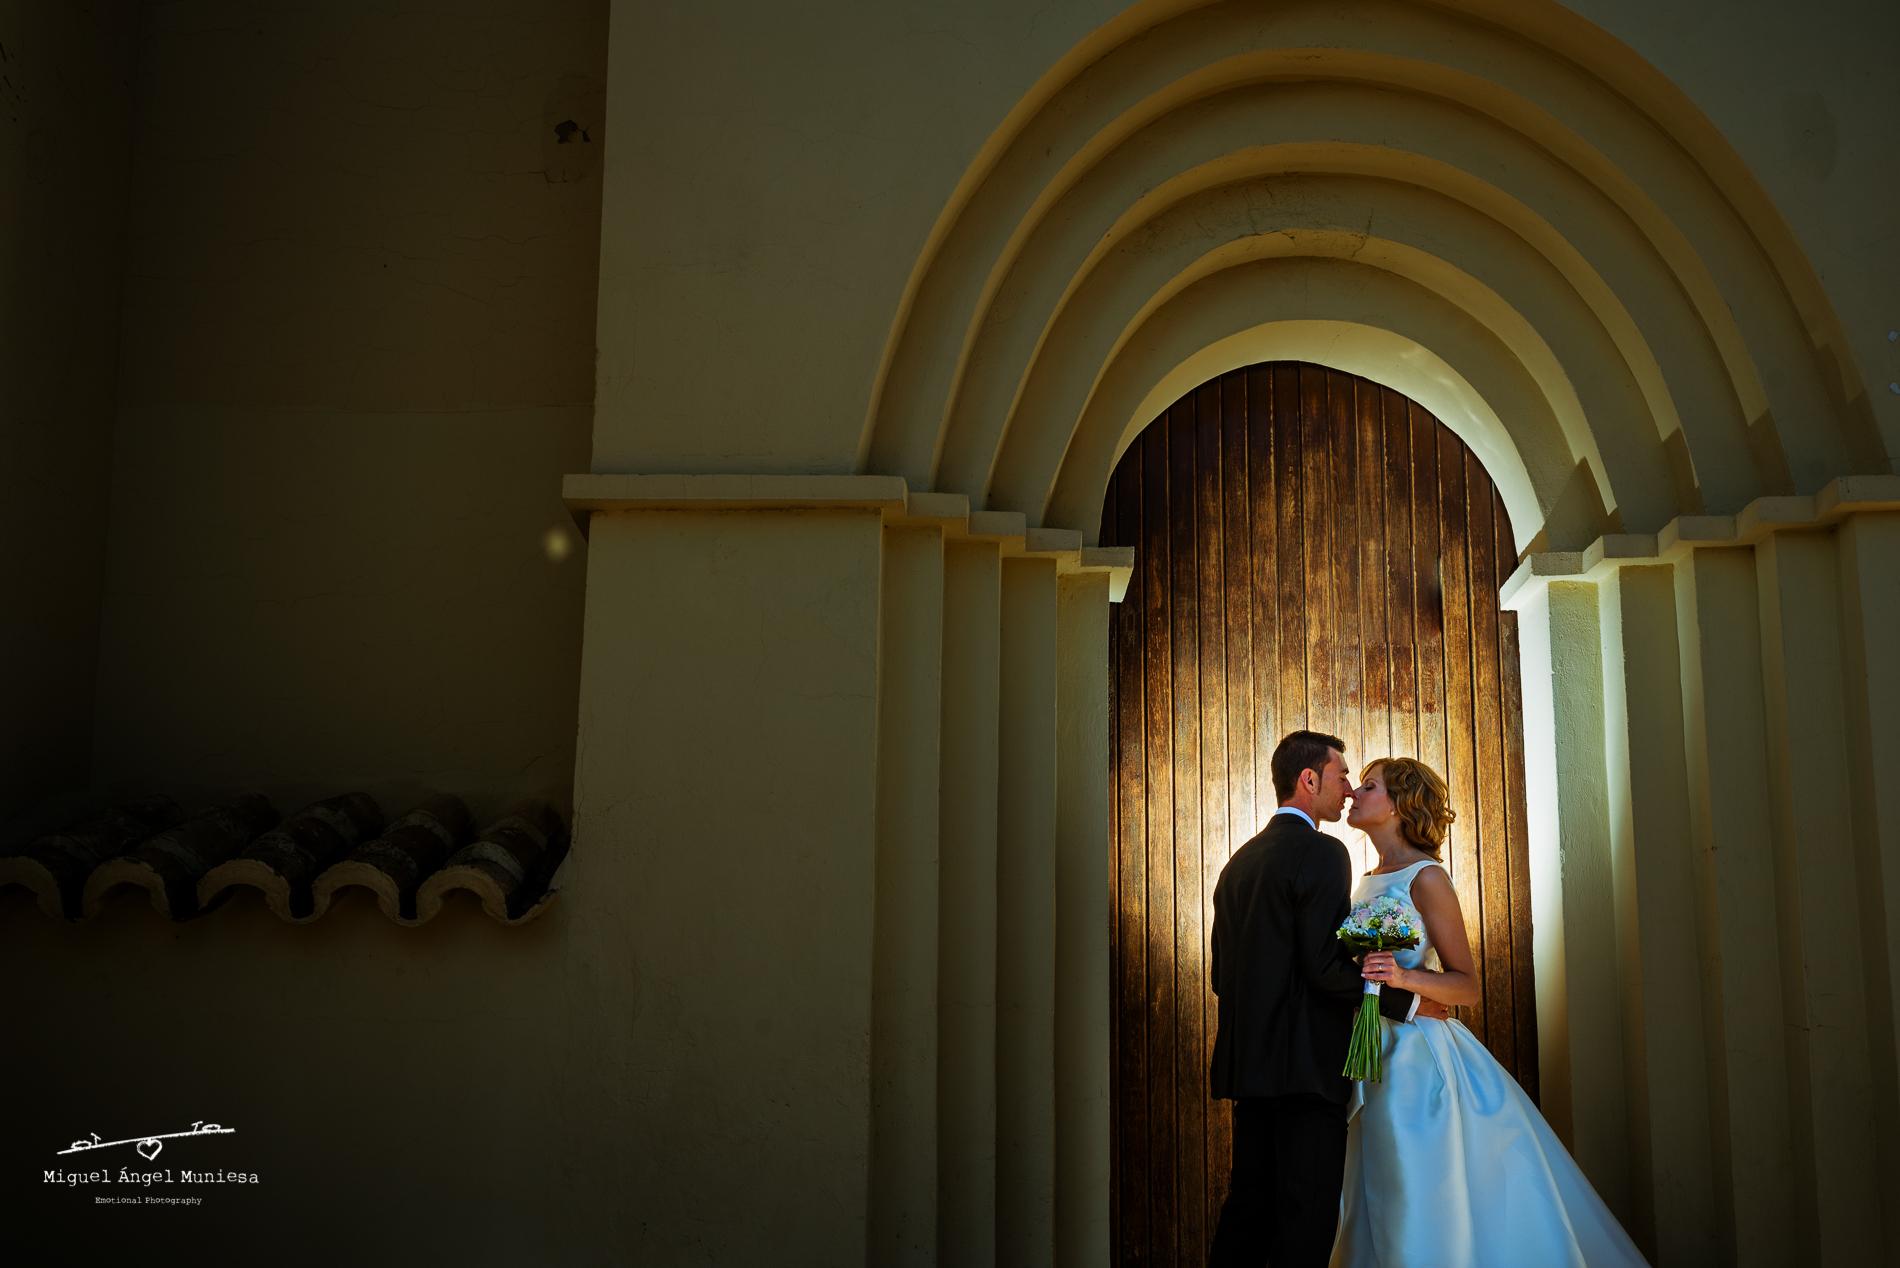 boda, fotografia de boda, boda zaragoza, fotografia, wedding, wedding photography, miguel angel muniesa, fotografo boda Zaragoza, fotografo boda, destination wedding_ 033